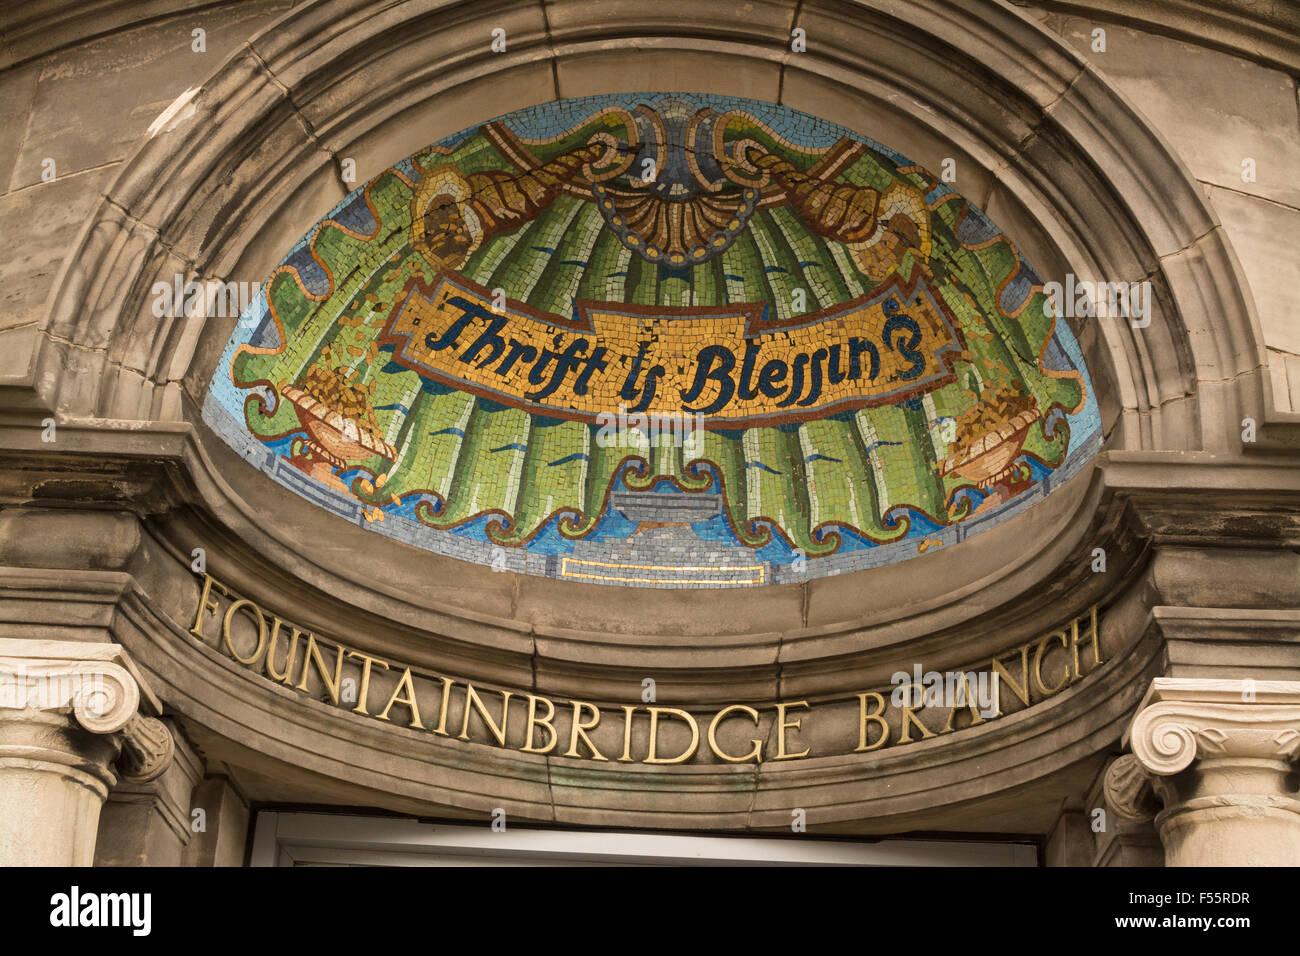 'Thrift is Blessing' mosaic  over entrance to Lloyds TSB Fountainbridge Branch, Edinburgh, Scotland,UK - Stock Image